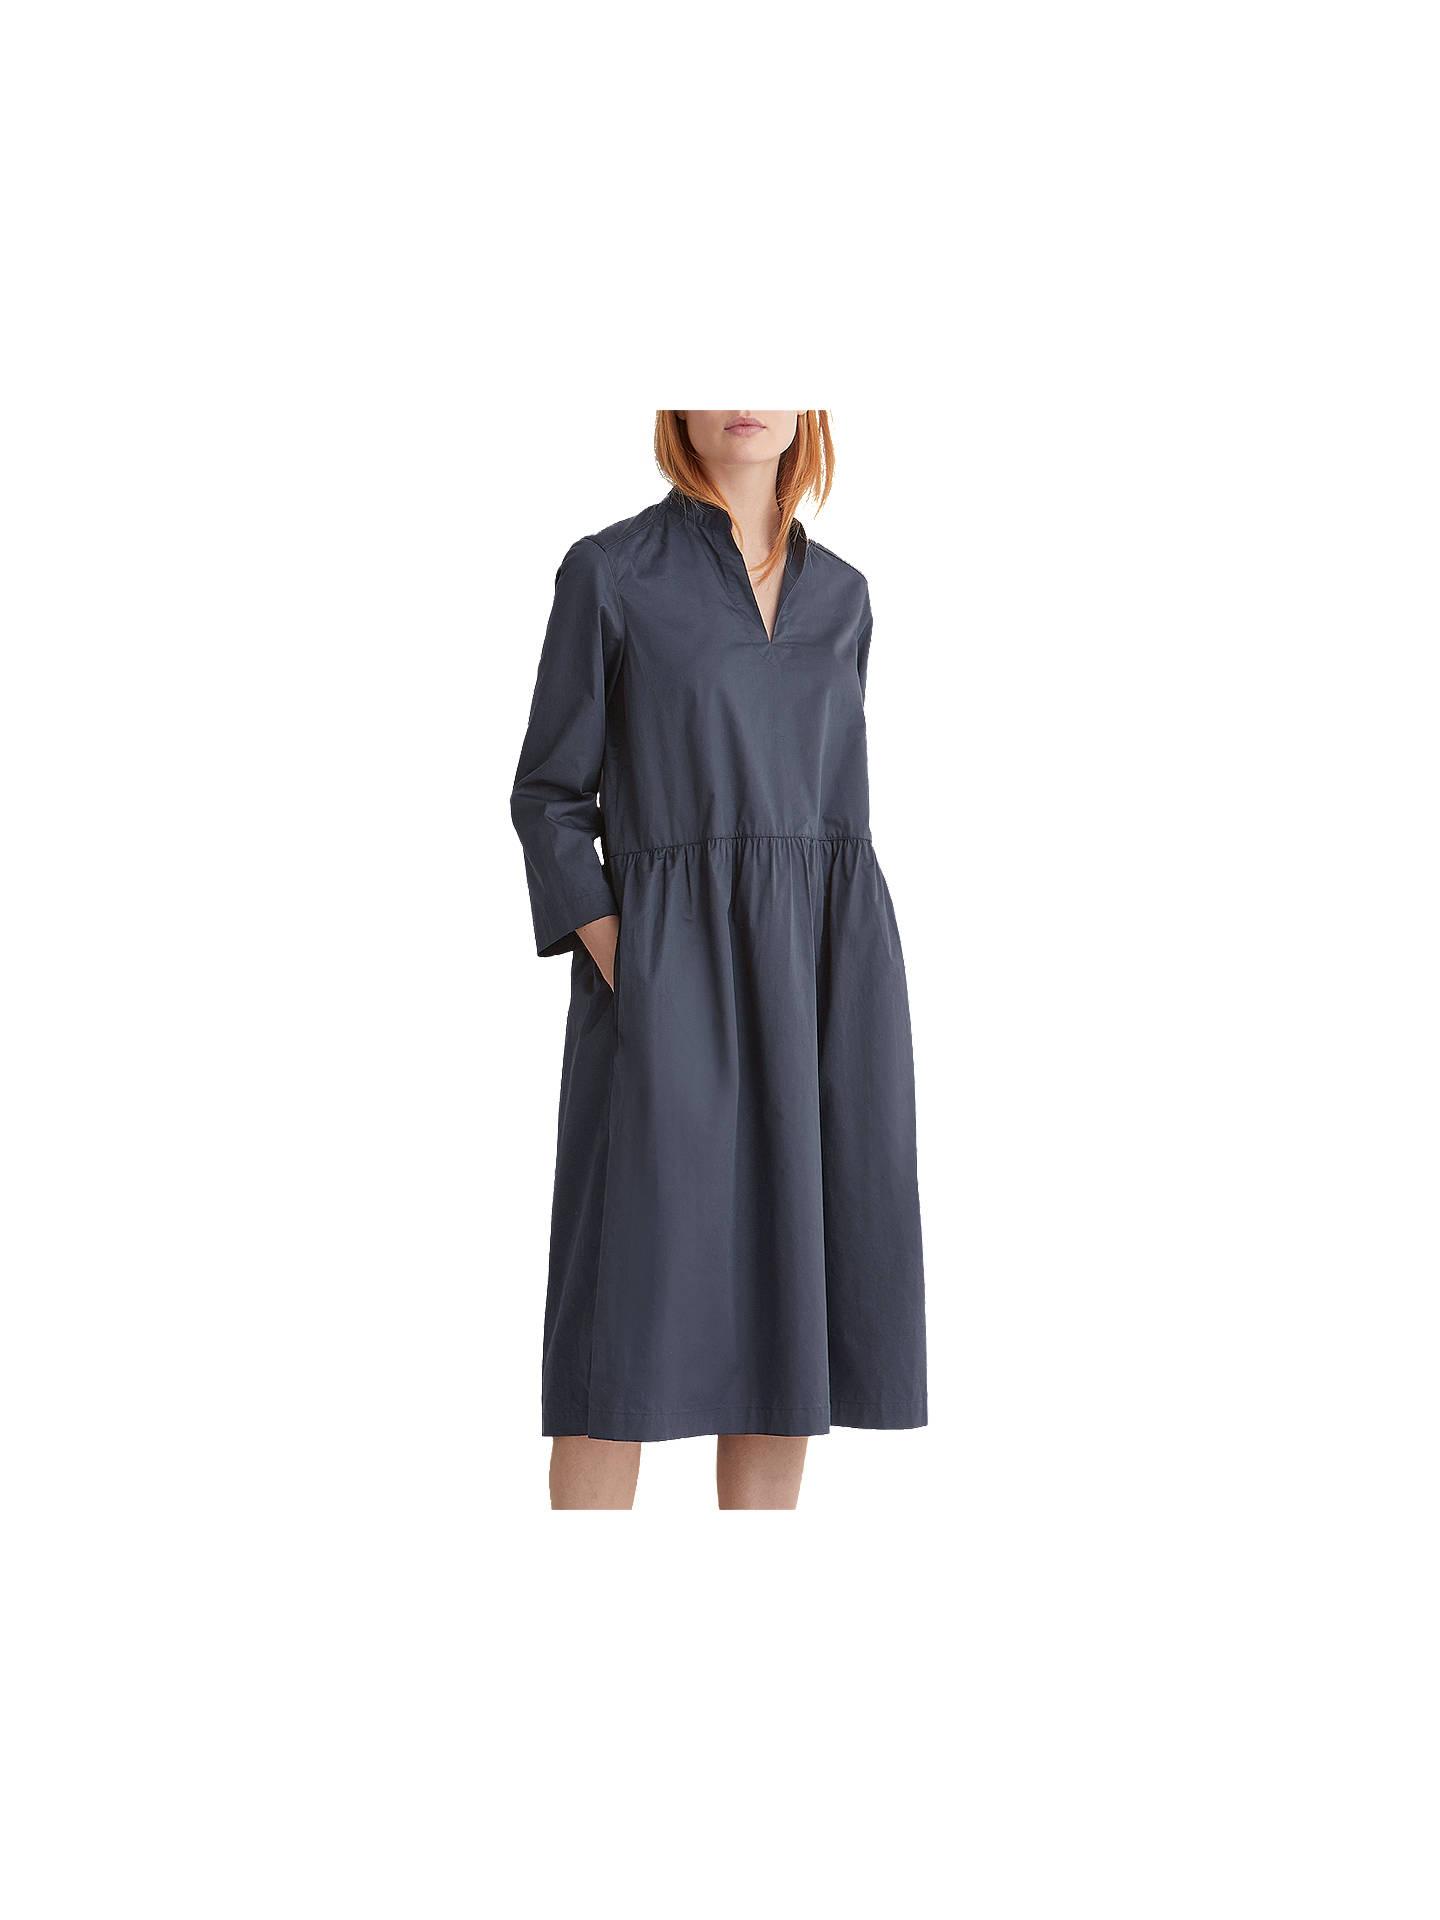 7bc37658b95 Buy Toast Poplin Gathered Waist Dress